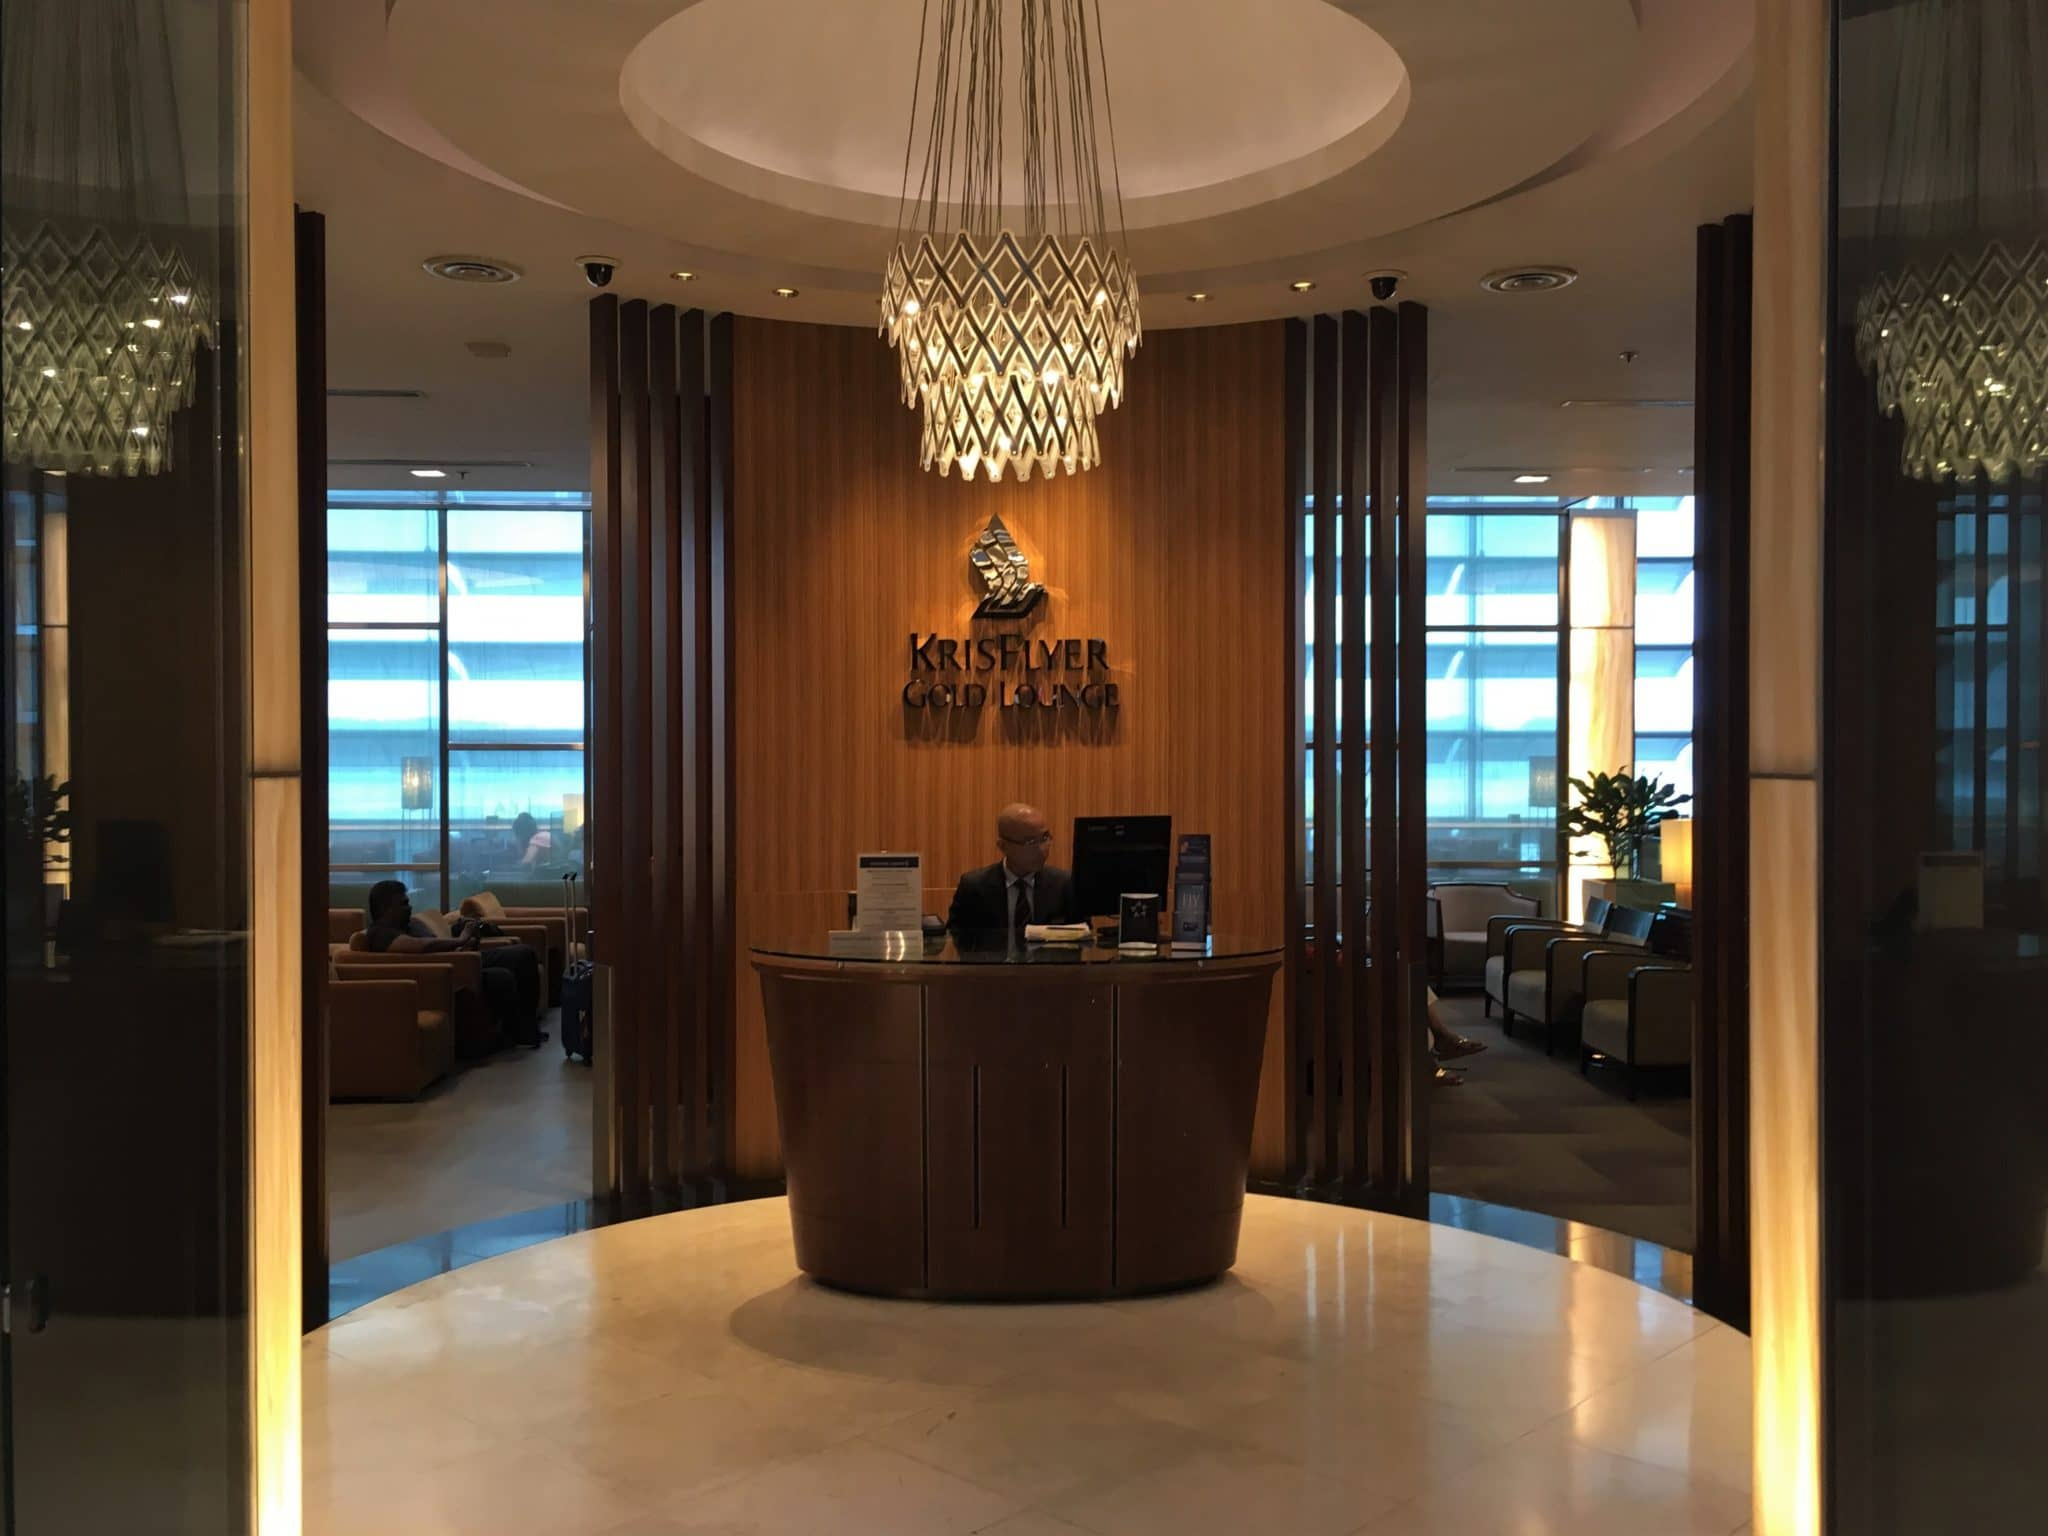 KrisFlyer Gold Lounge Changi Airport Terminal 3 - Empfangsbereich